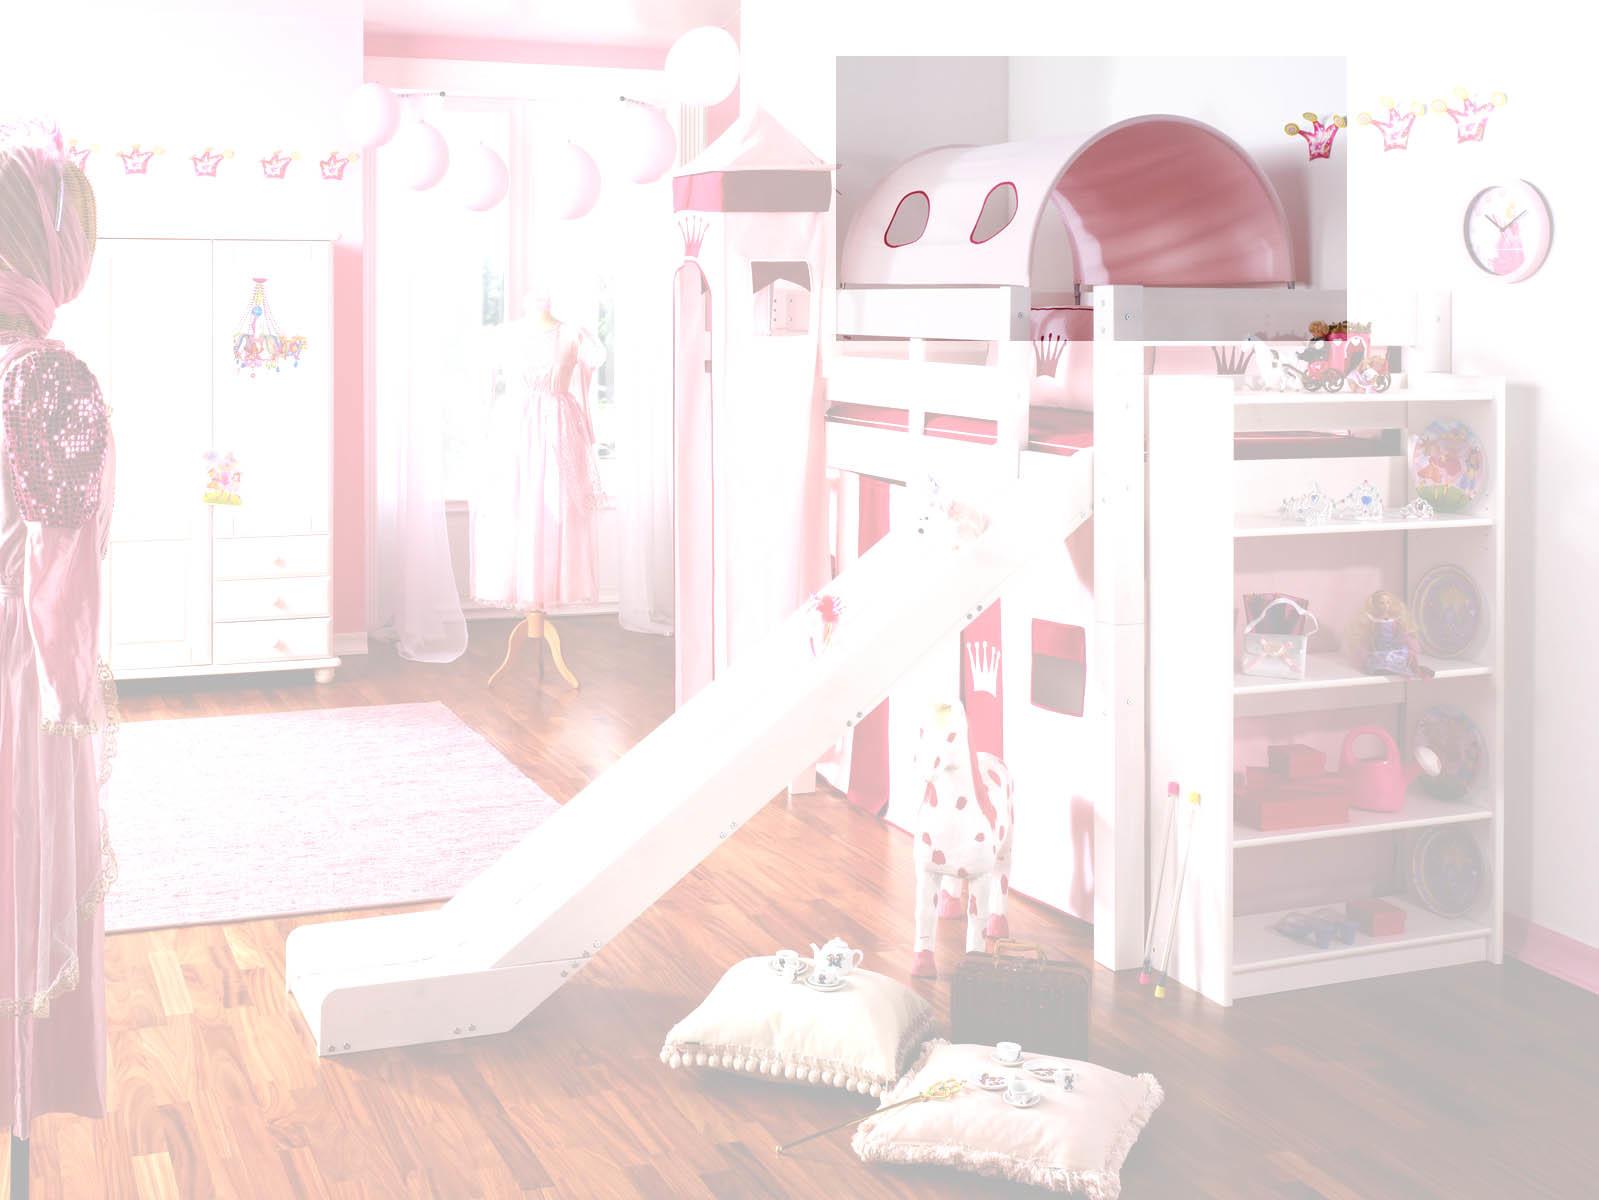 Prinzessinnenbett Hochbett mit Turm, weiß-rosa, Massivholz, Bild 3